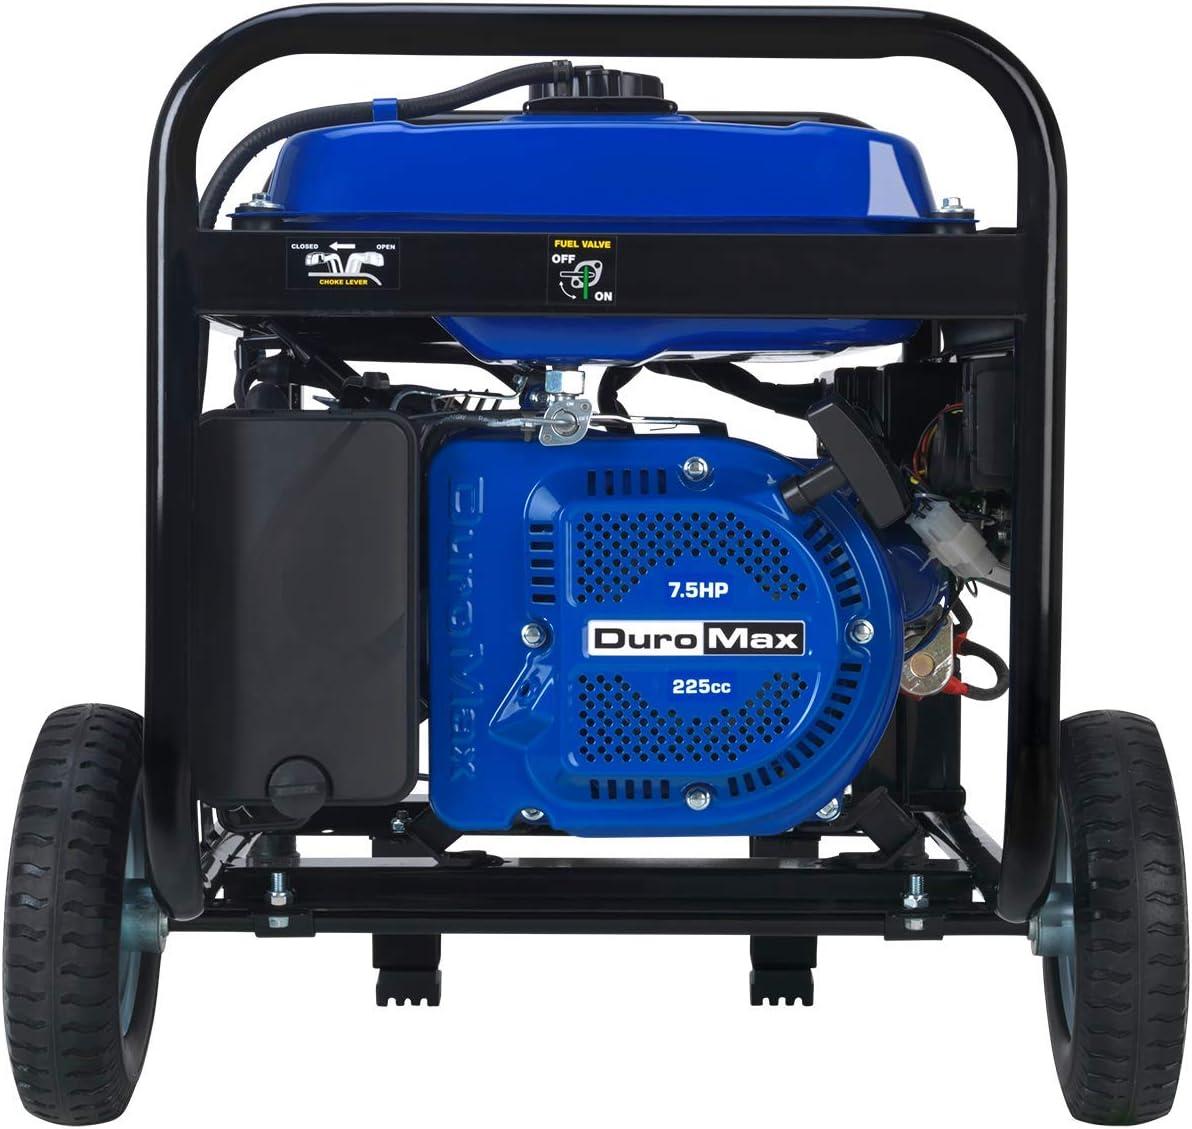 Amazon.com: DuroMax XP5500E generador portable a gasolina ...